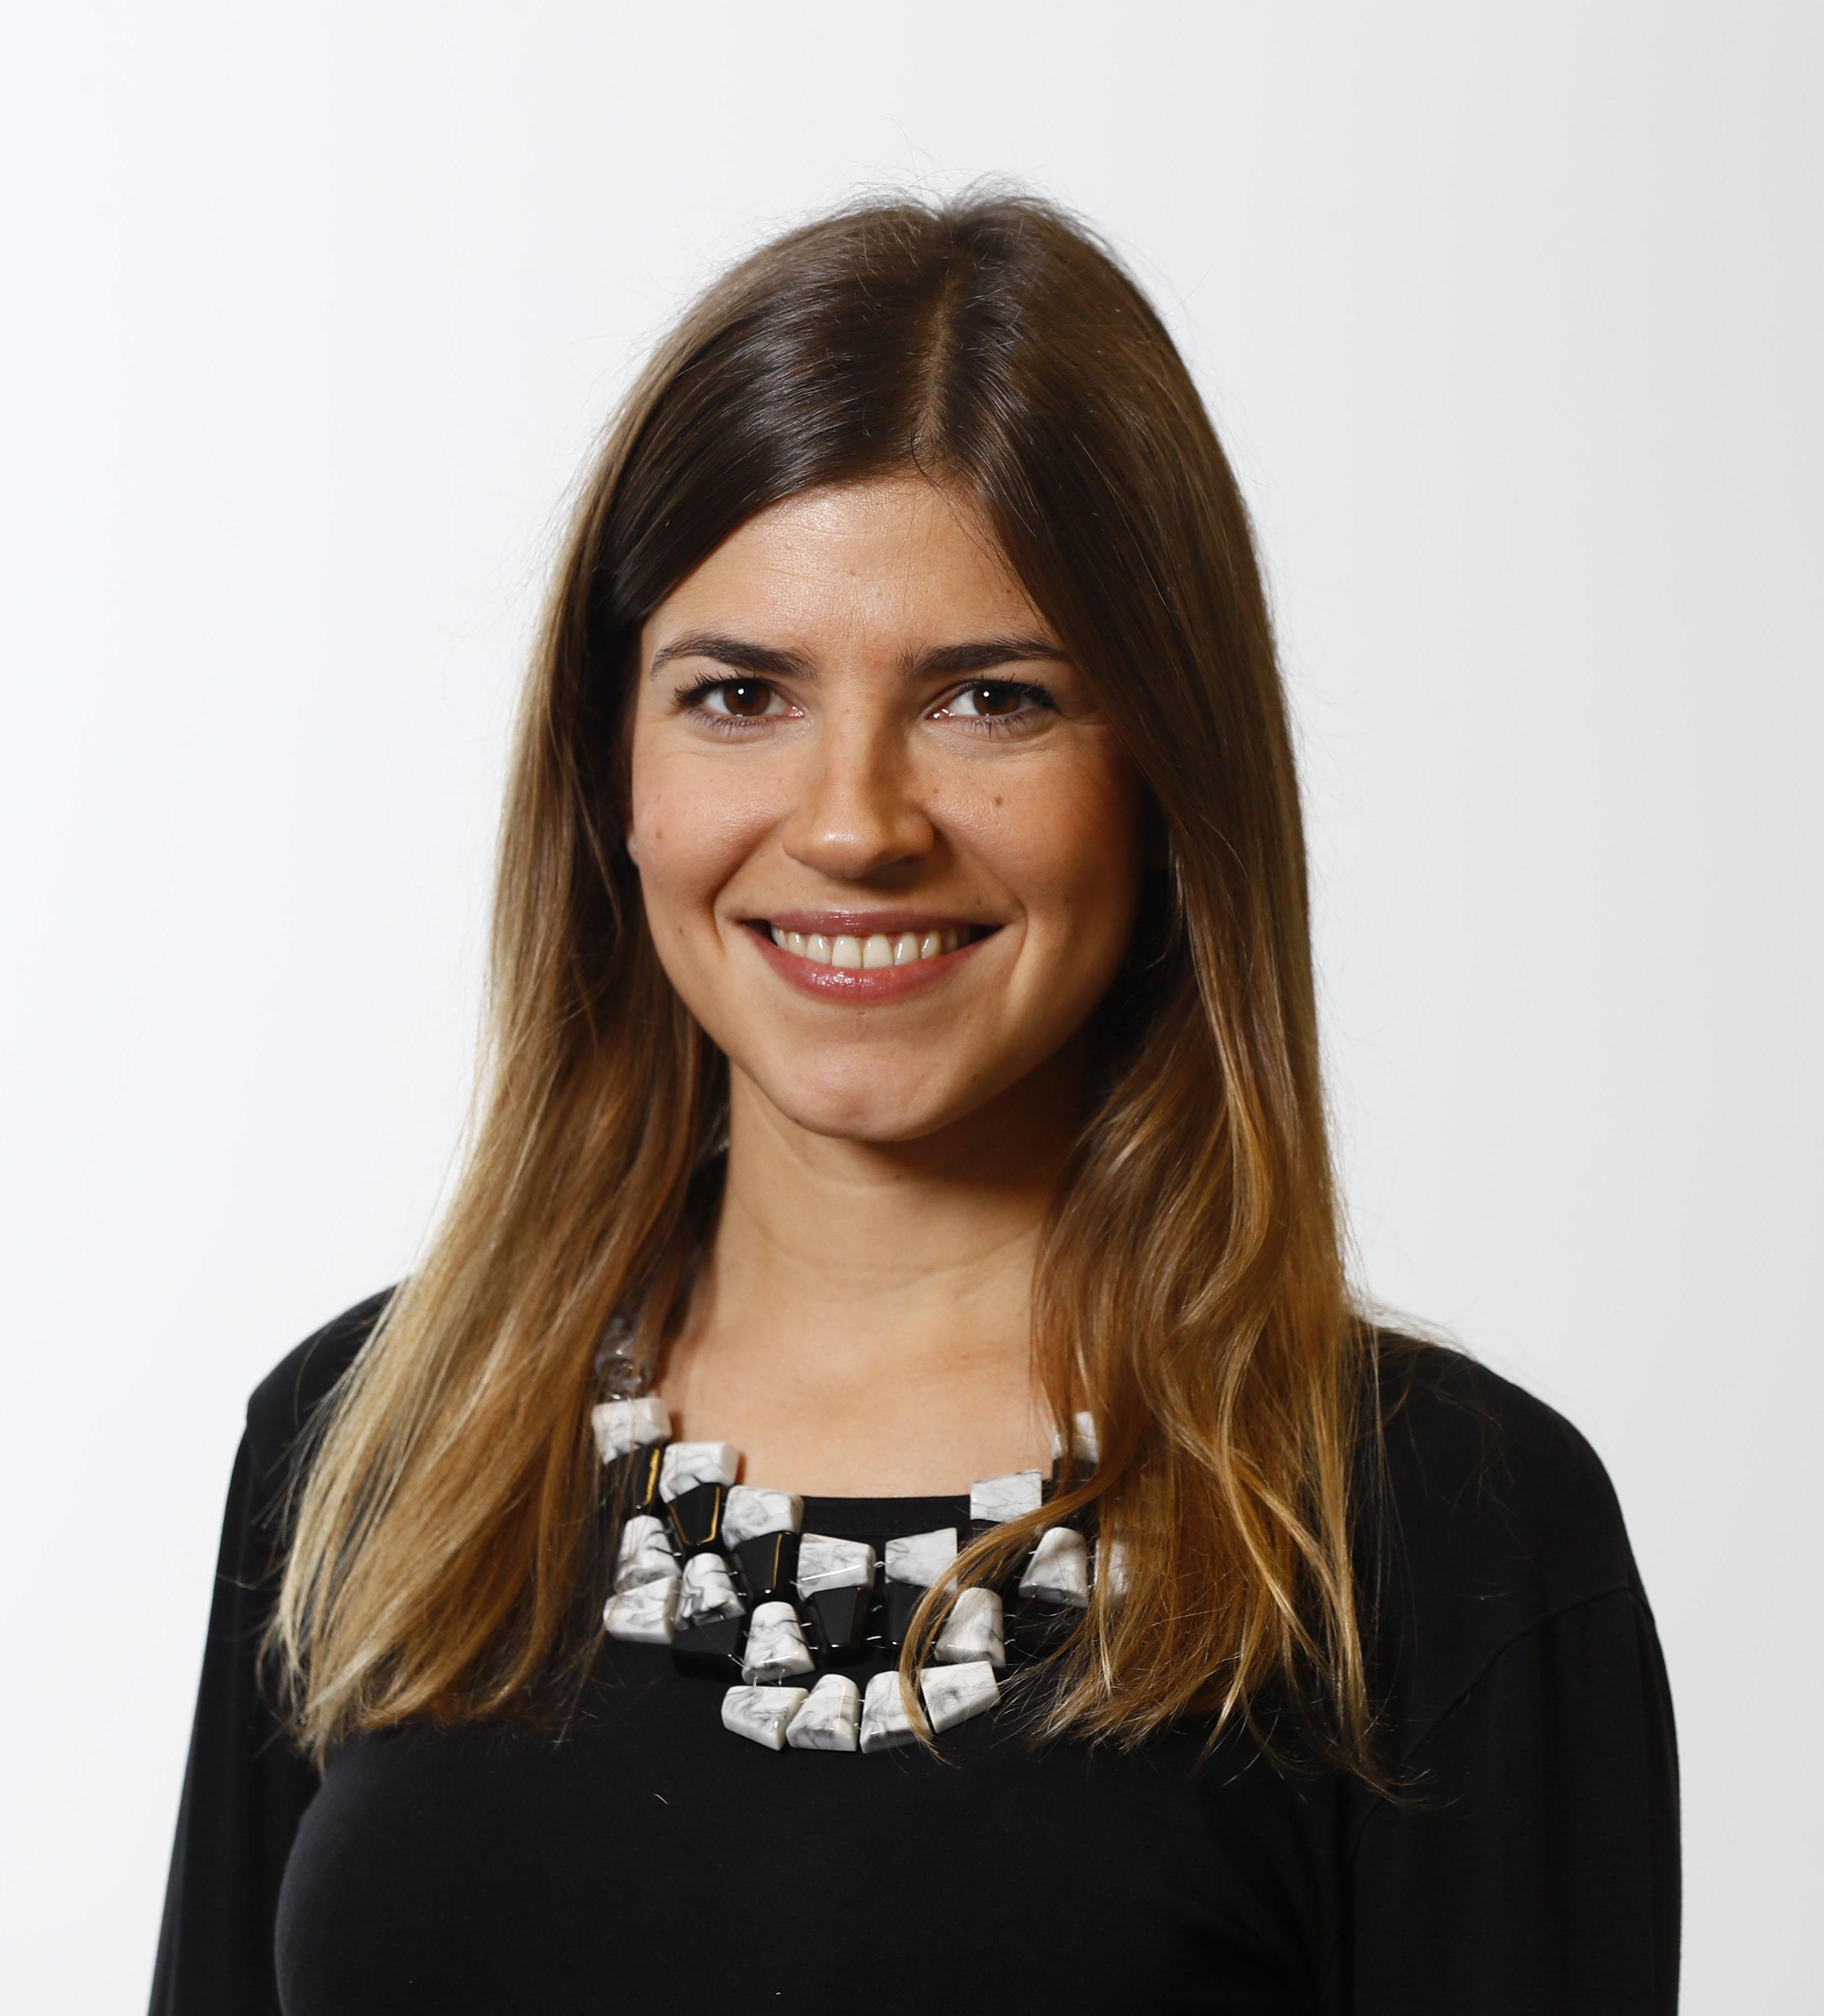 Sandrine Pellassy